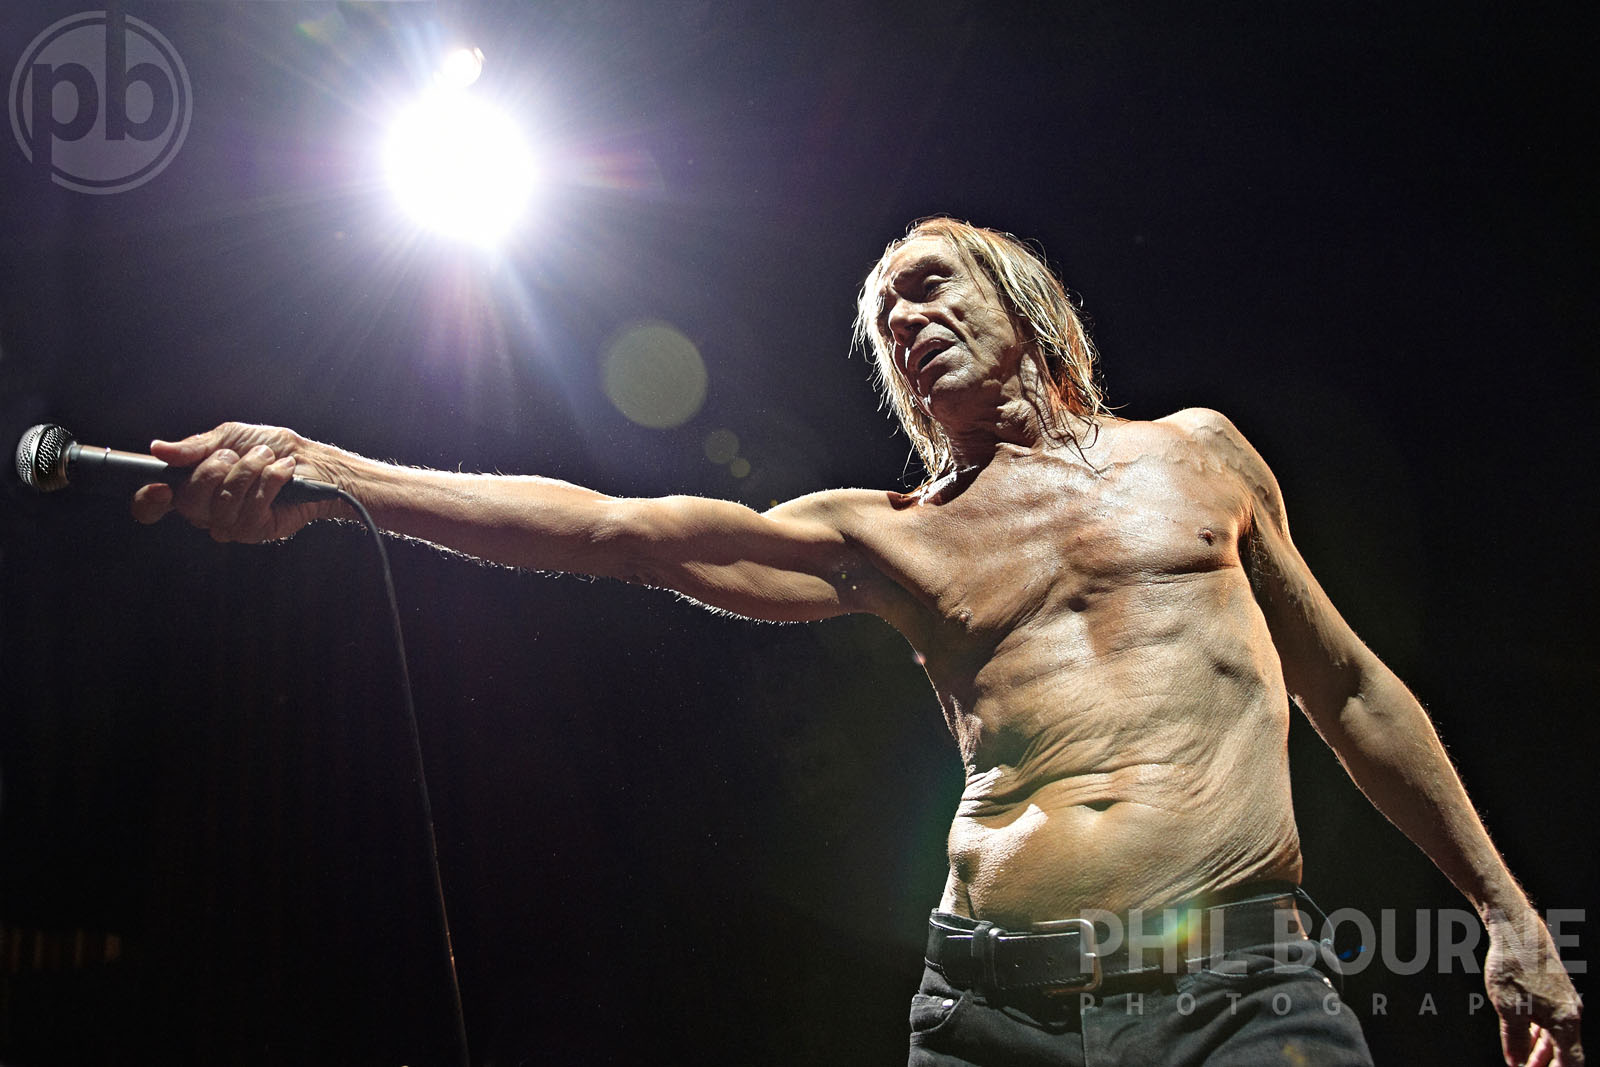 010_Live_Music_Photographer_London_Iggy_The_Stooges_001.jpg